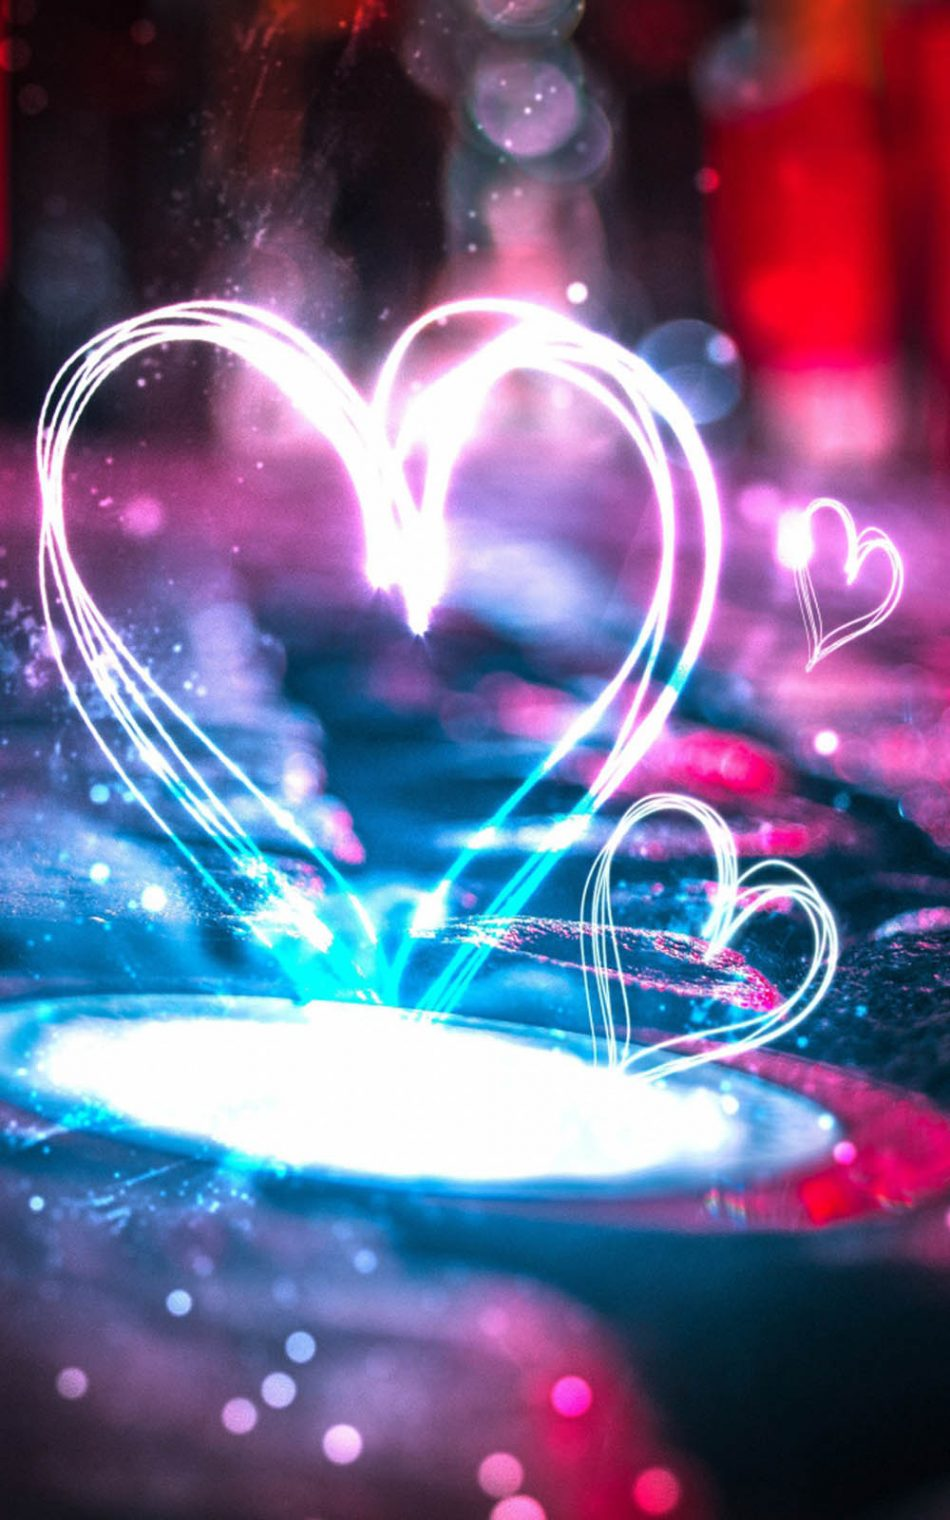 Download heart shape lights free pure 4k ultra hd mobile - 4k love wallpaper for mobile ...